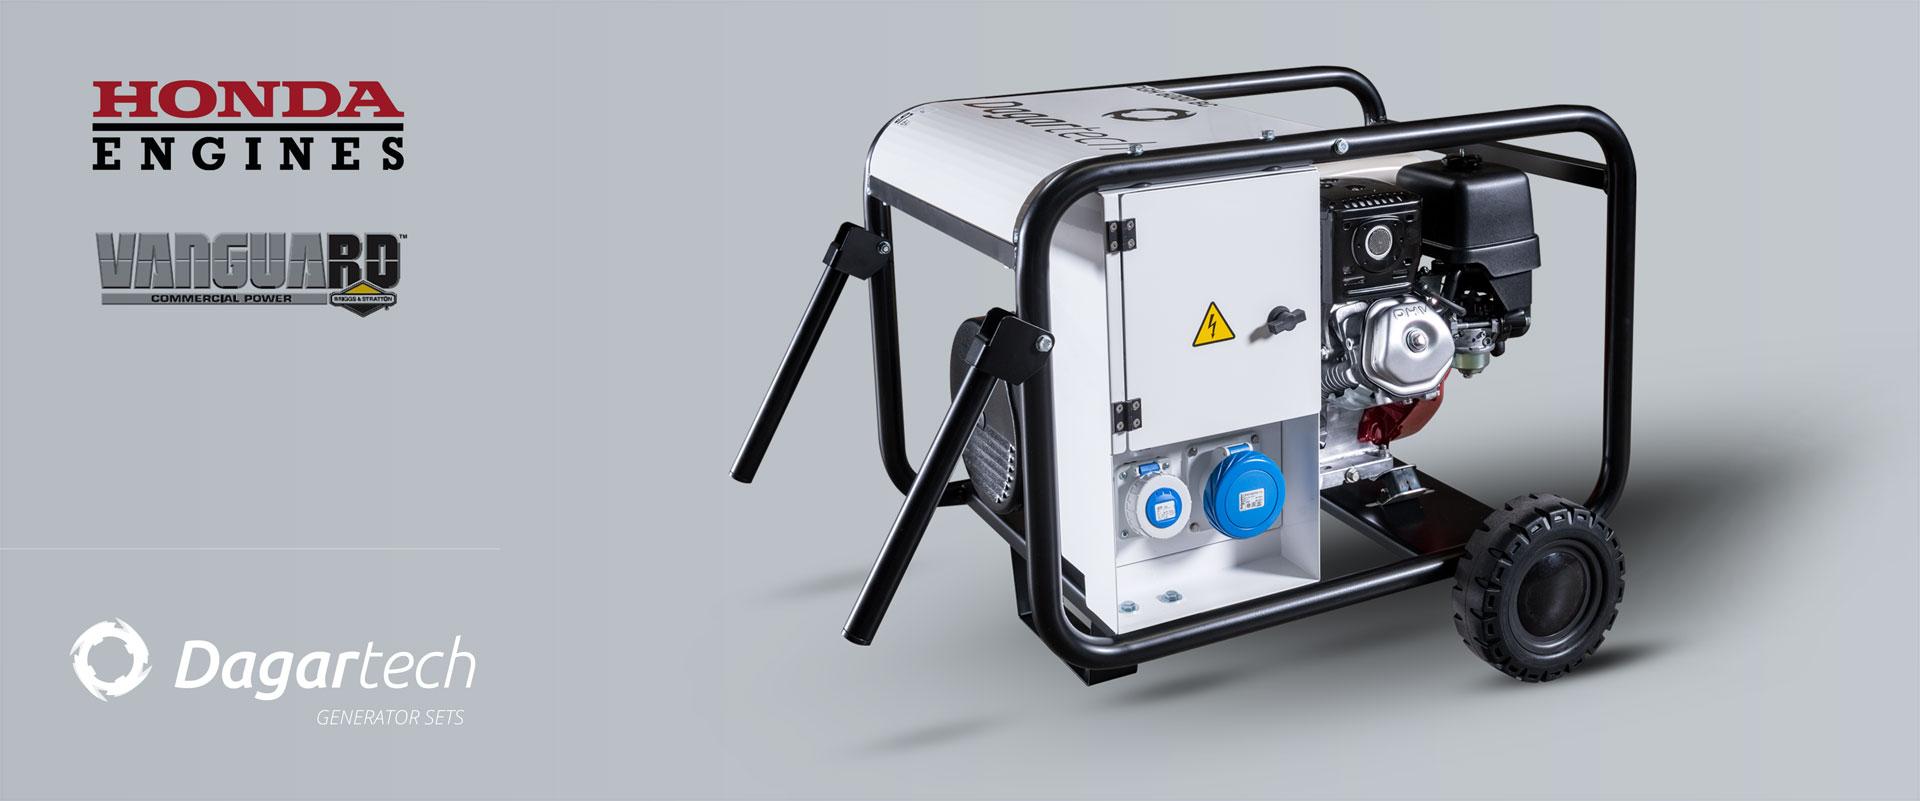 Dagartech BC Portable Range generator set for rental machinery applications